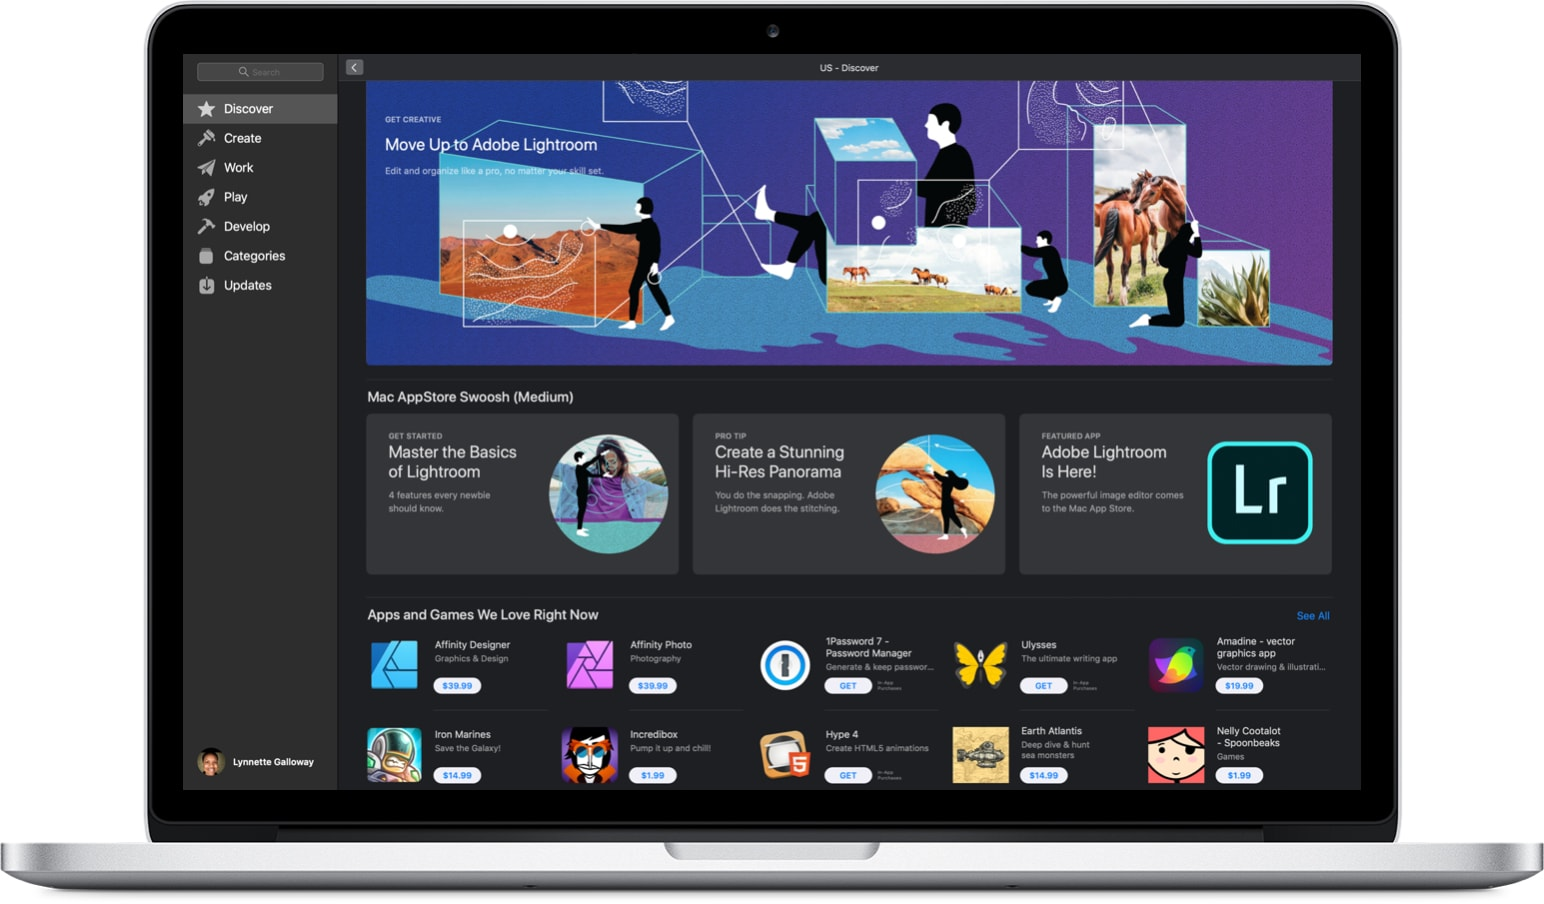 Adobe Lightroom na Mac App Store